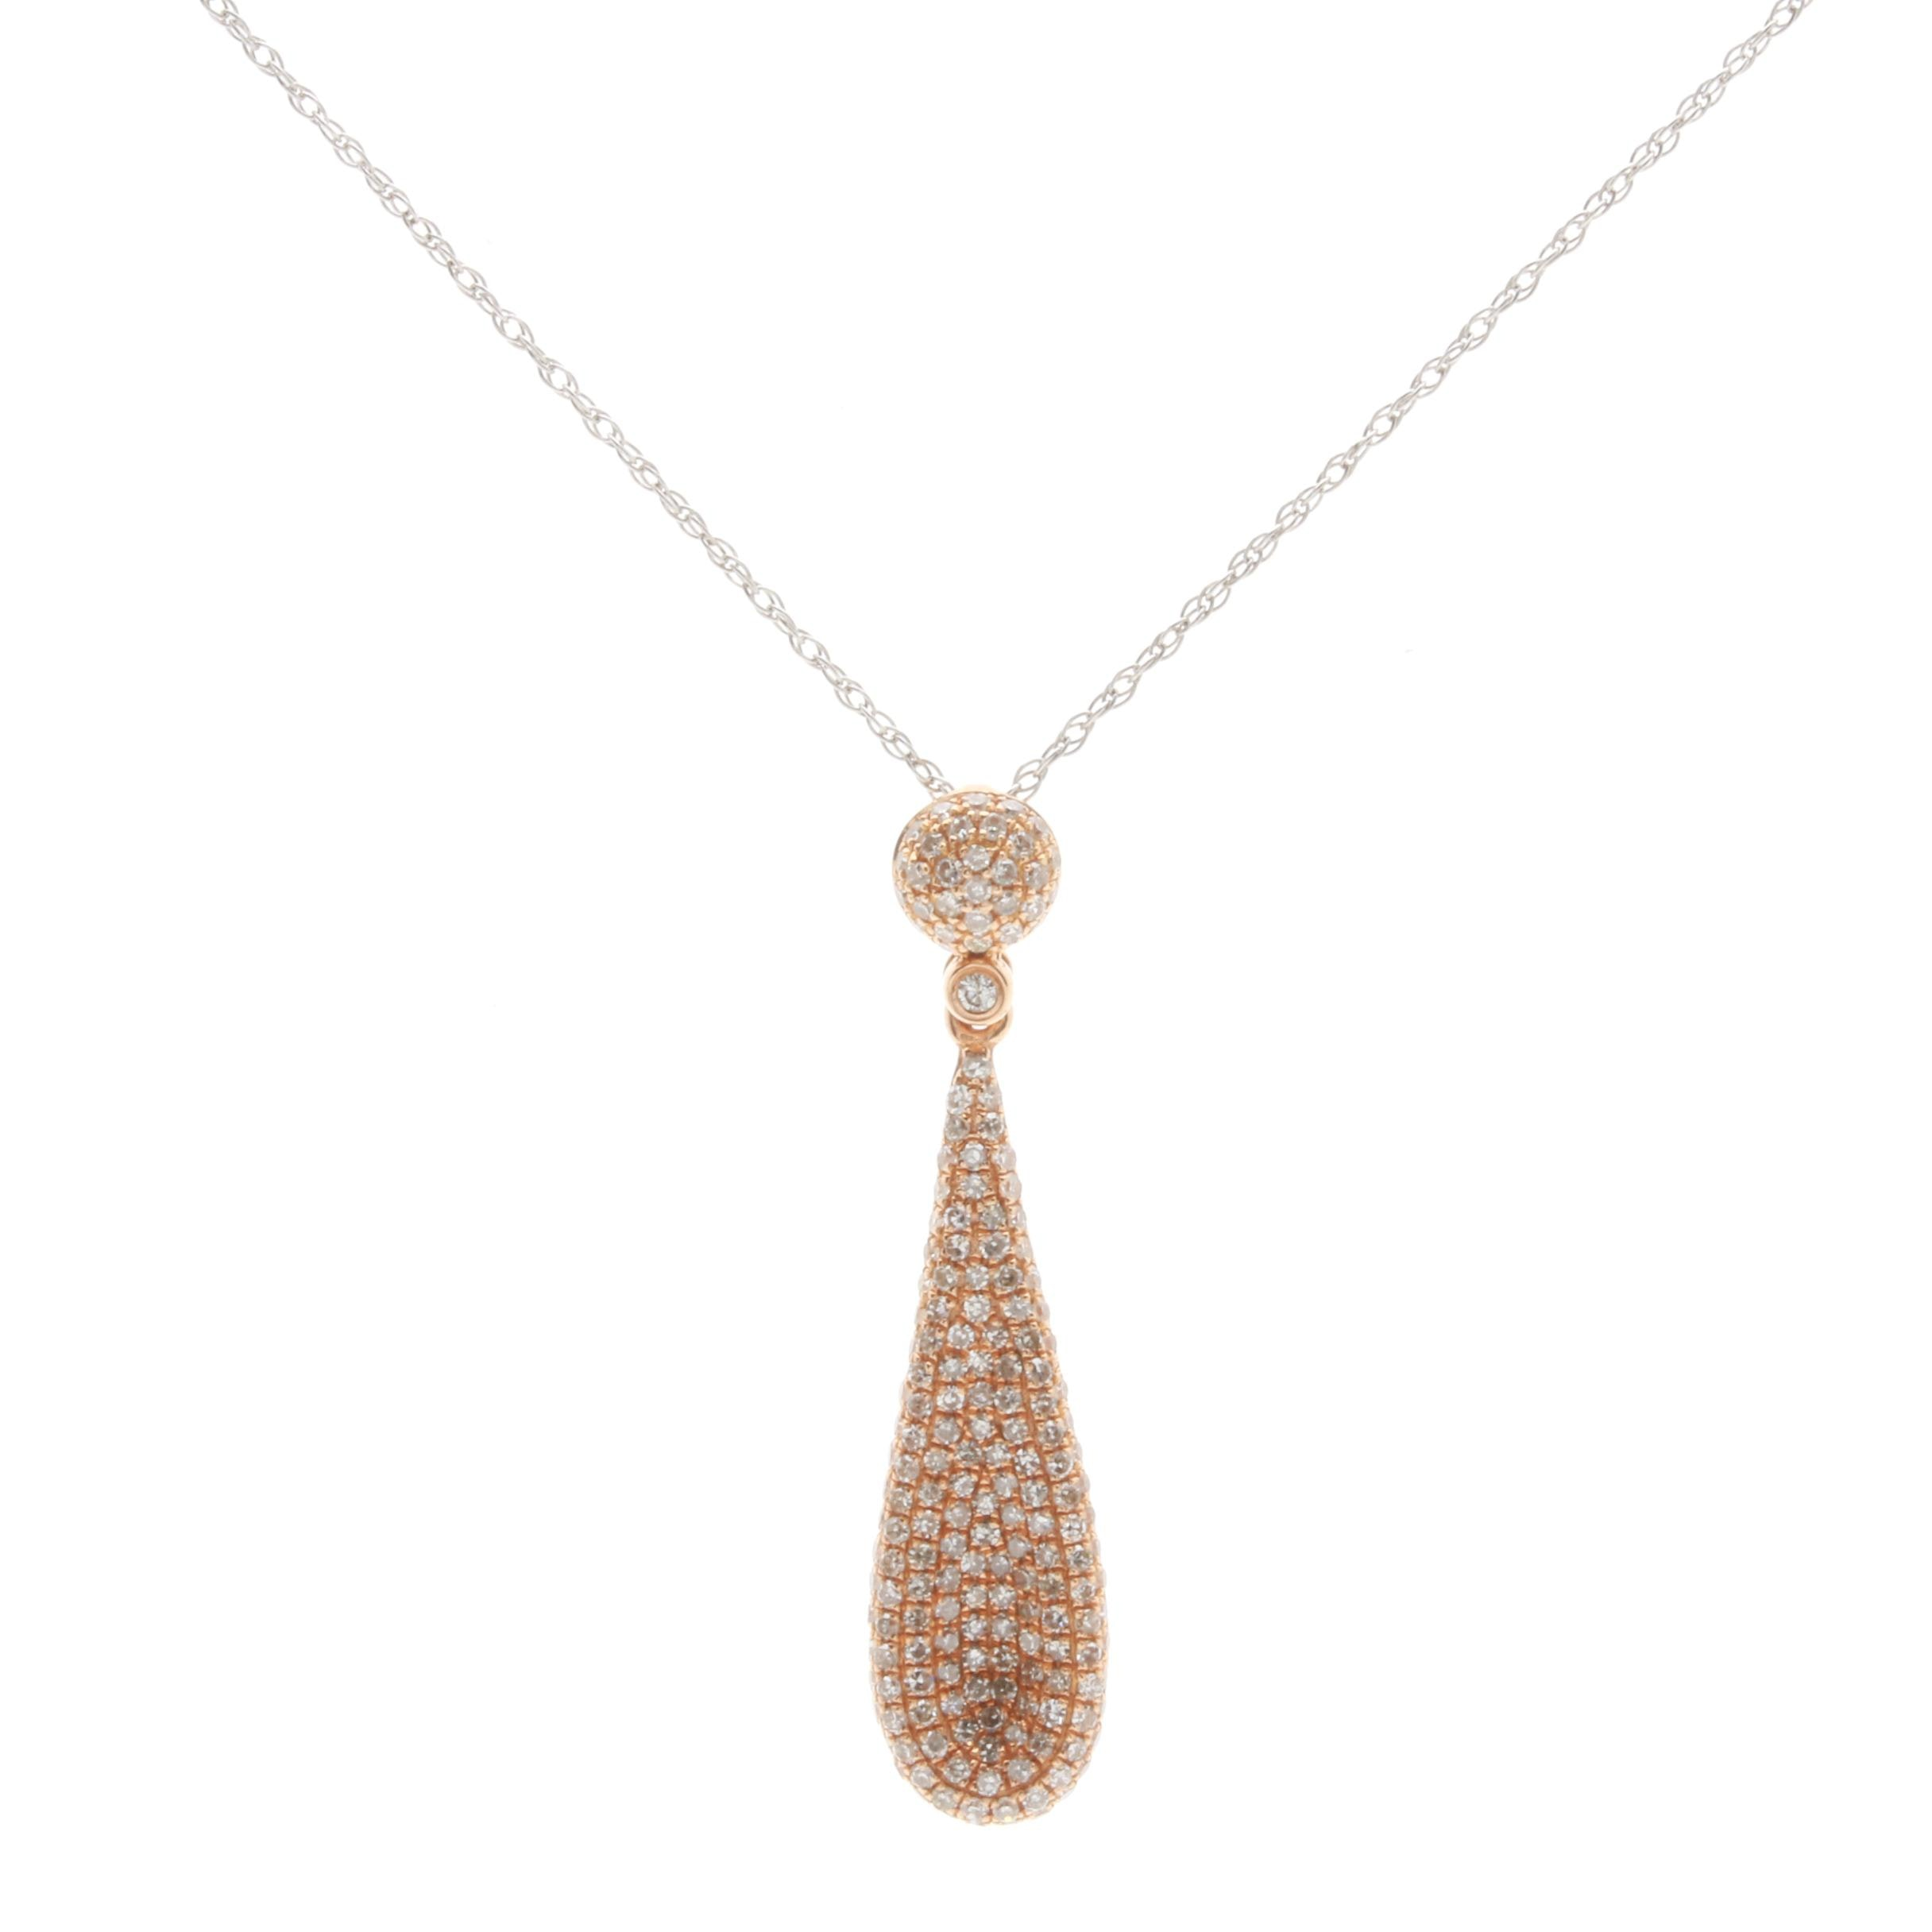 14K White Gold and 18K Rose Gold Diamond Pendant Necklace